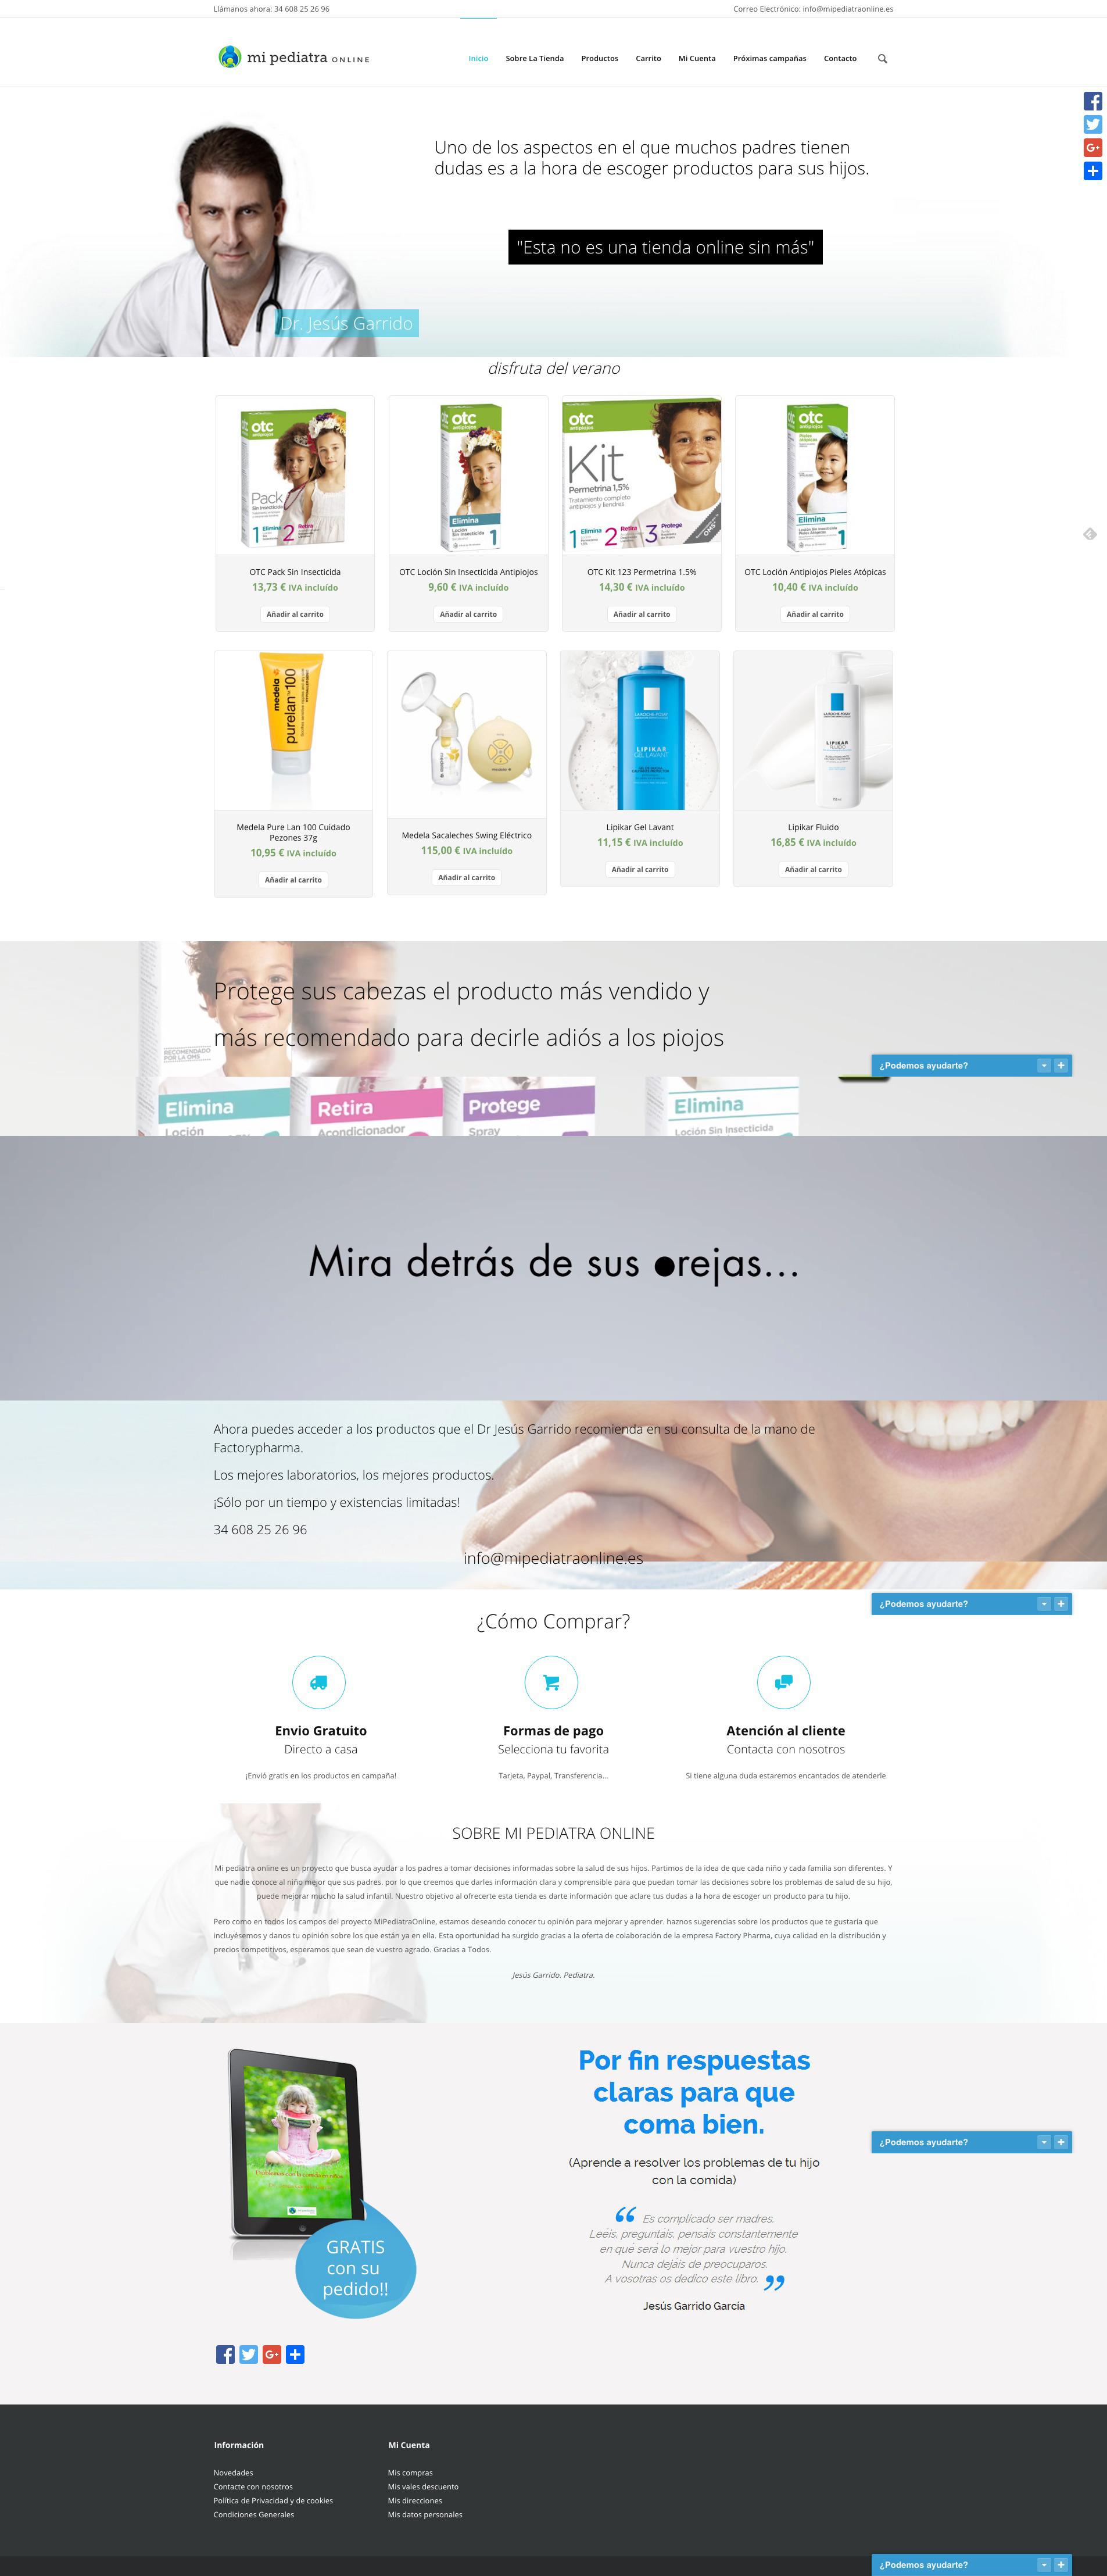 Web completa Mi Pediatra Online